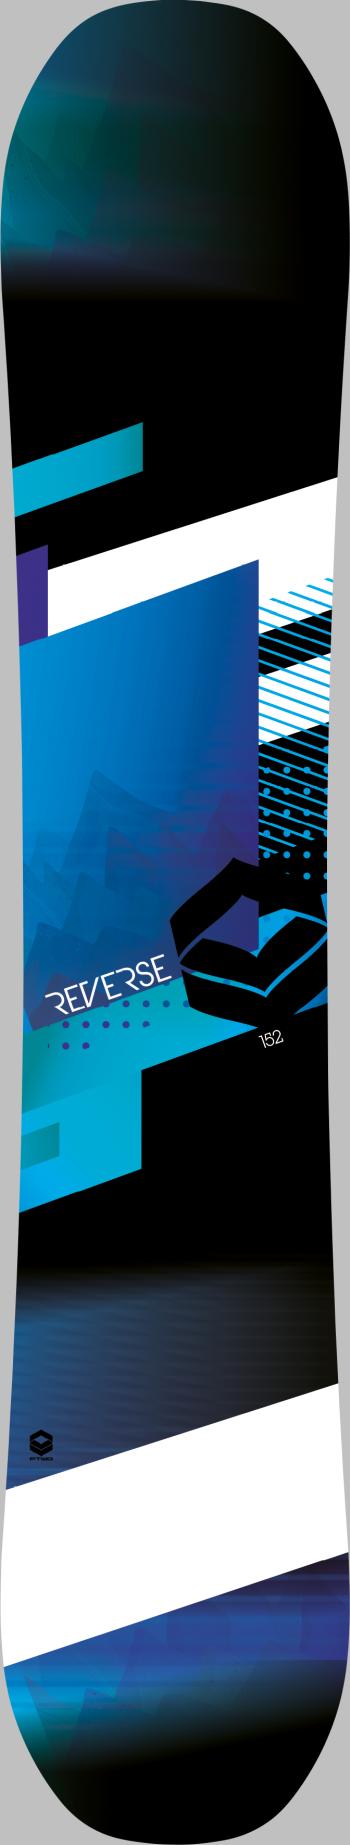 Reverse blue - Top